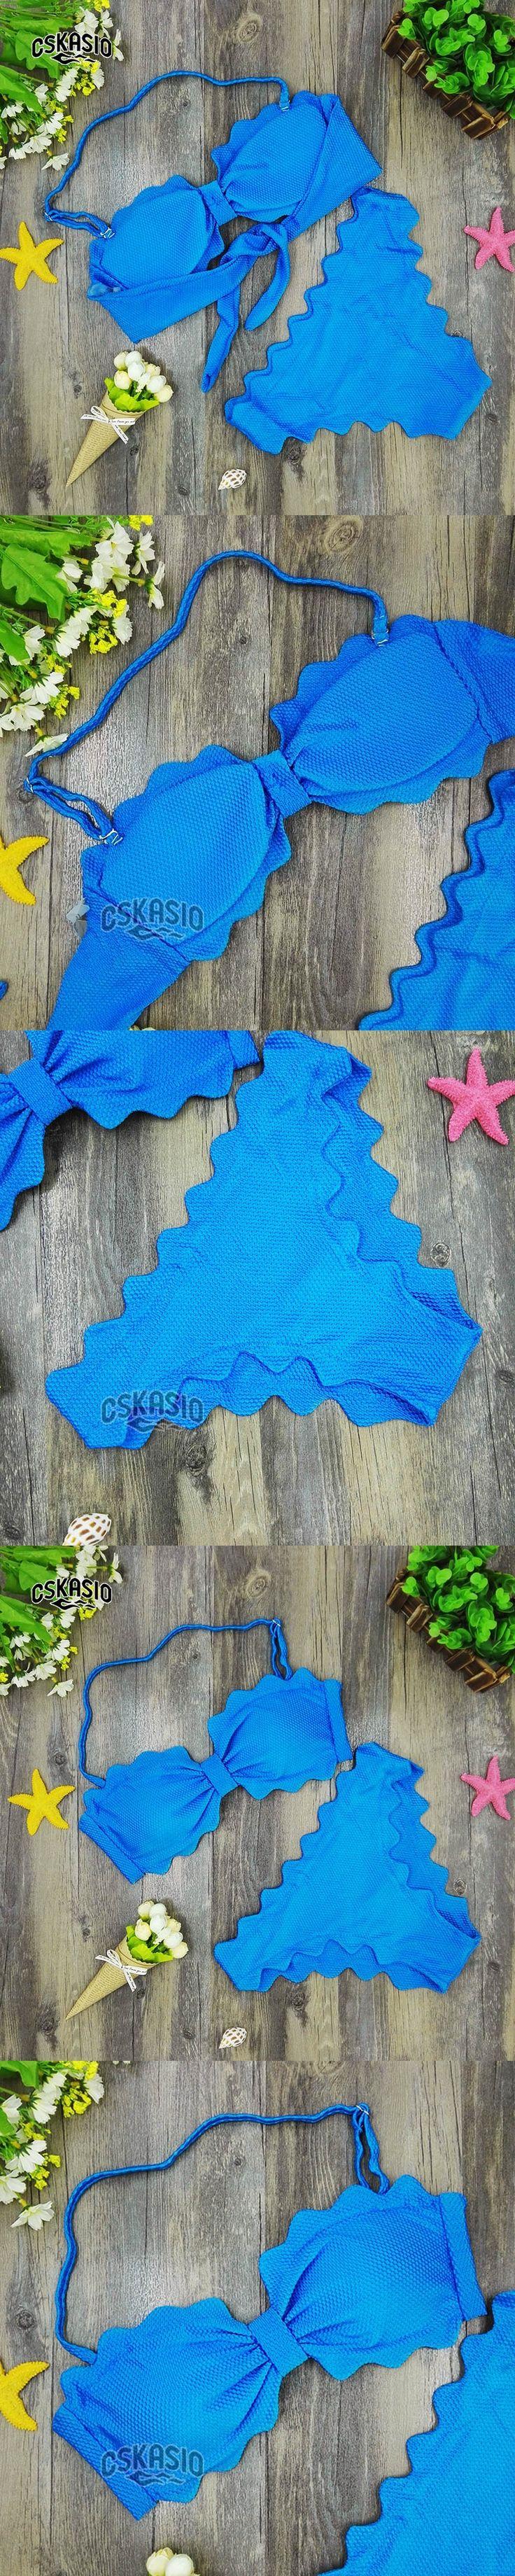 2017 Cute Scalloped Swimwear Women Swimsuit Sexy Bandeau Bikini Set Blue Biquini Padded Bathing Suits maillot de bain femme S-L